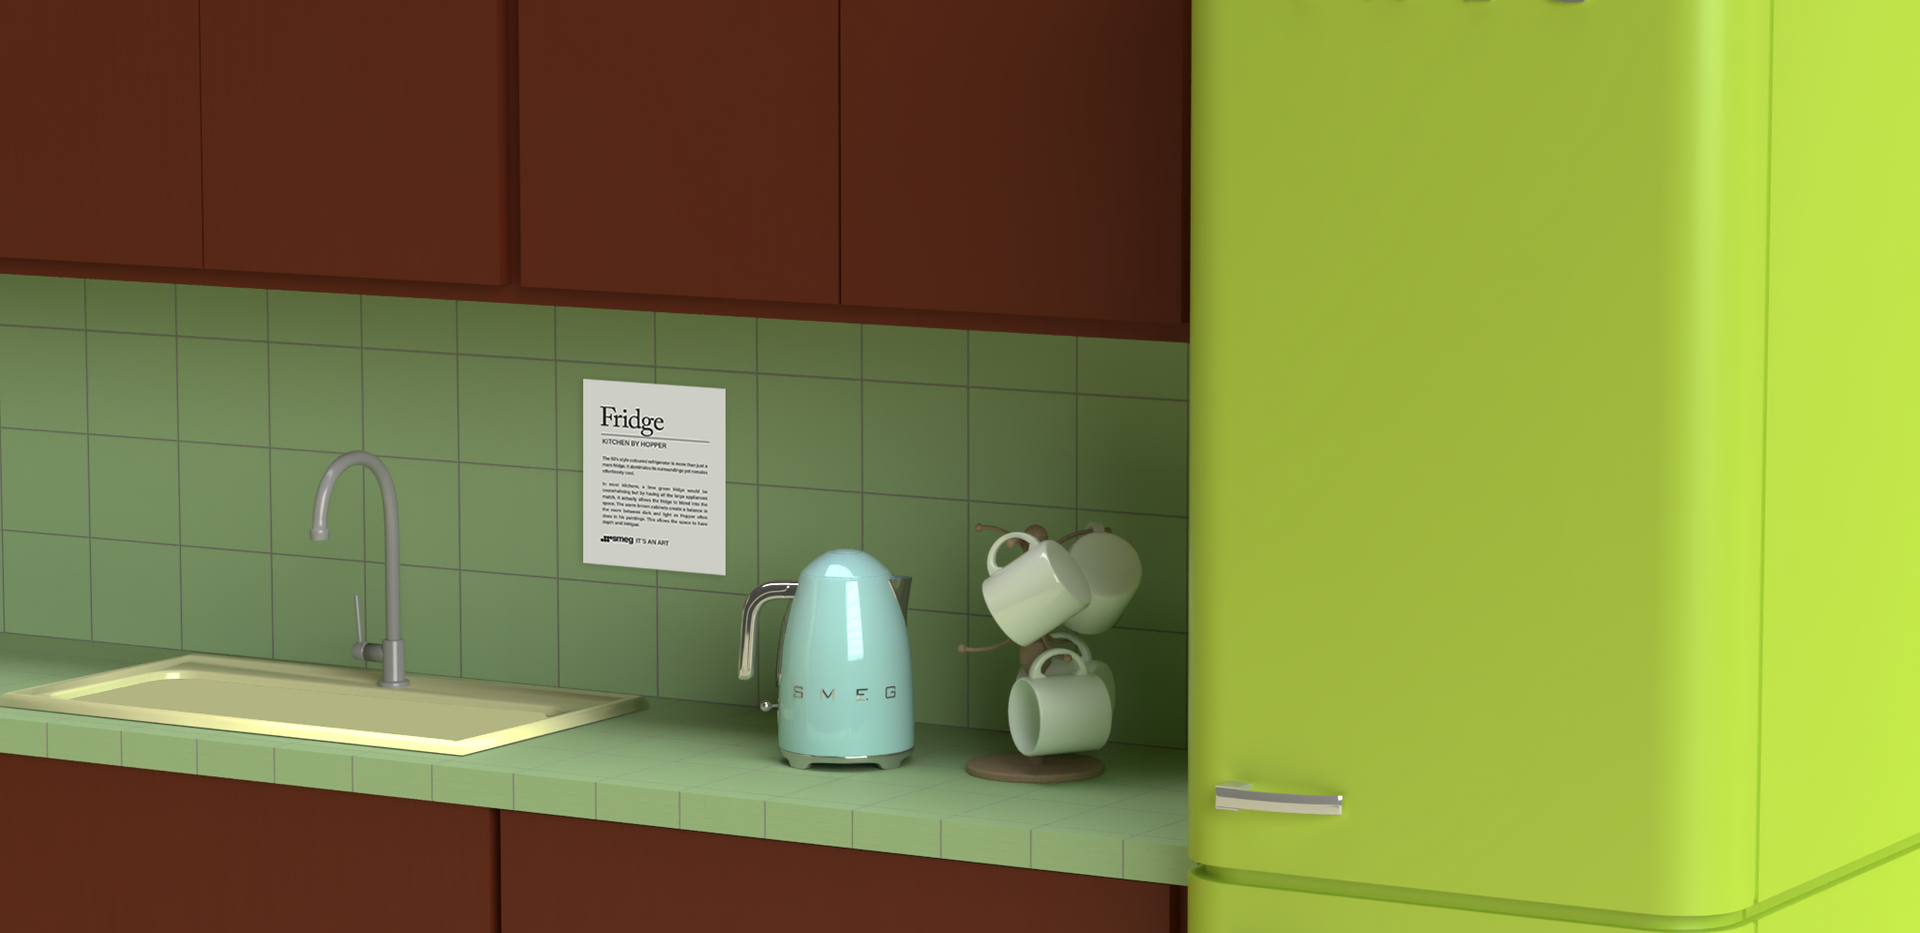 Hopper_fridge.png